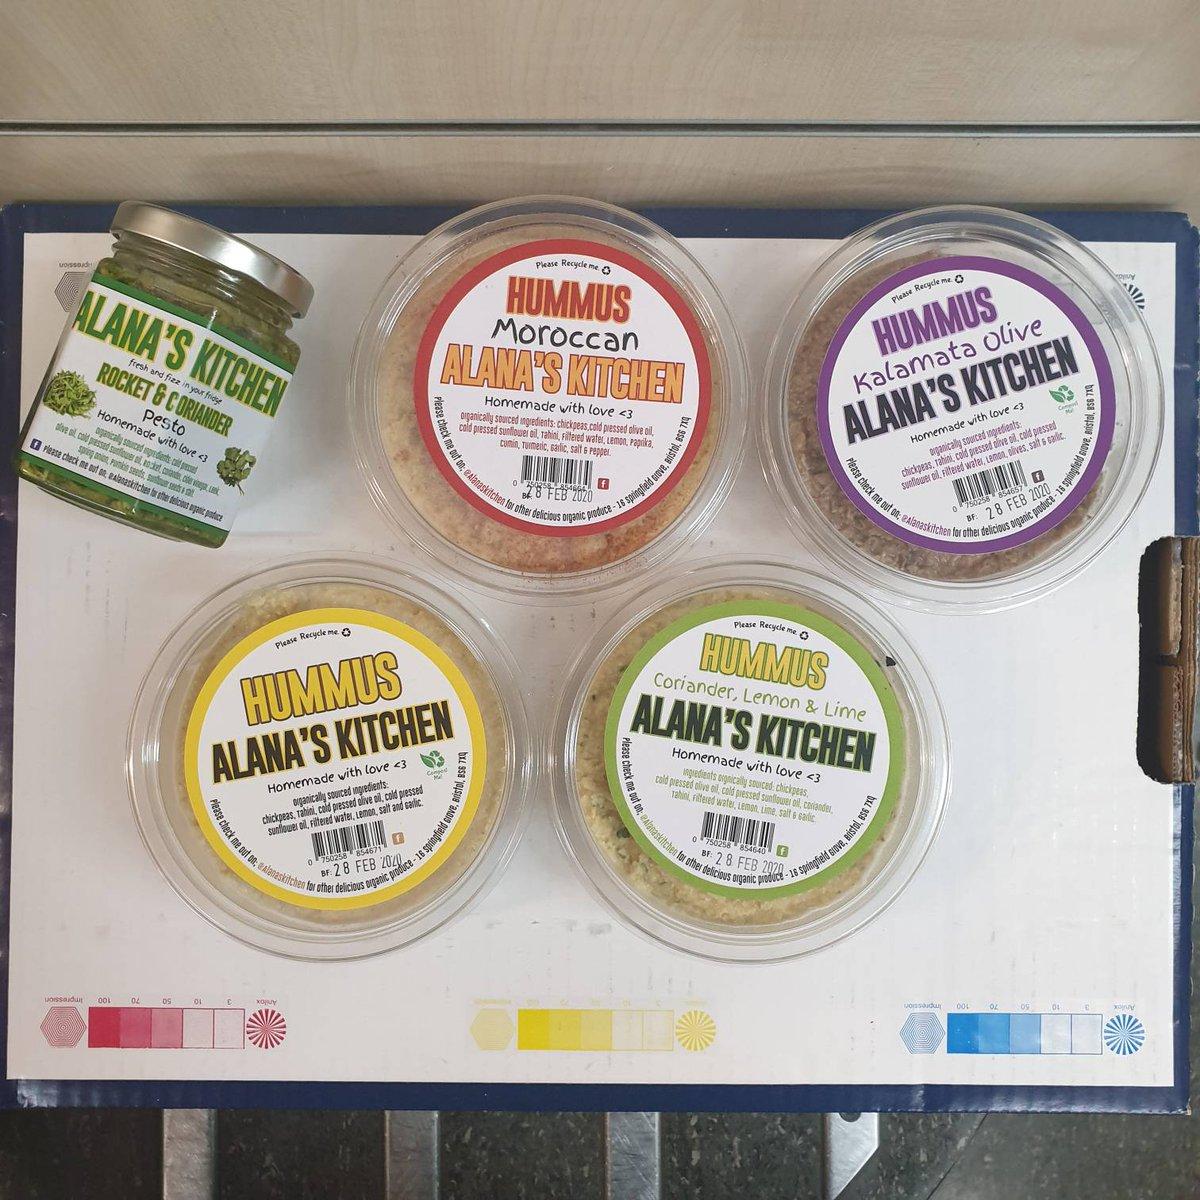 Hummus from Alana's kitchen, tastes amazing . #Deliciously Different . . . . .  #rawfood #vegan #raw #healthyfood #rawvegan #plantbased #organic #detox #rawfeeding #healthy #veganfood #healthylifestyle #vegetarian #glutenfree #barfdiet #rawmeal #superfood pic.twitter.com/pKk4kTPFcj